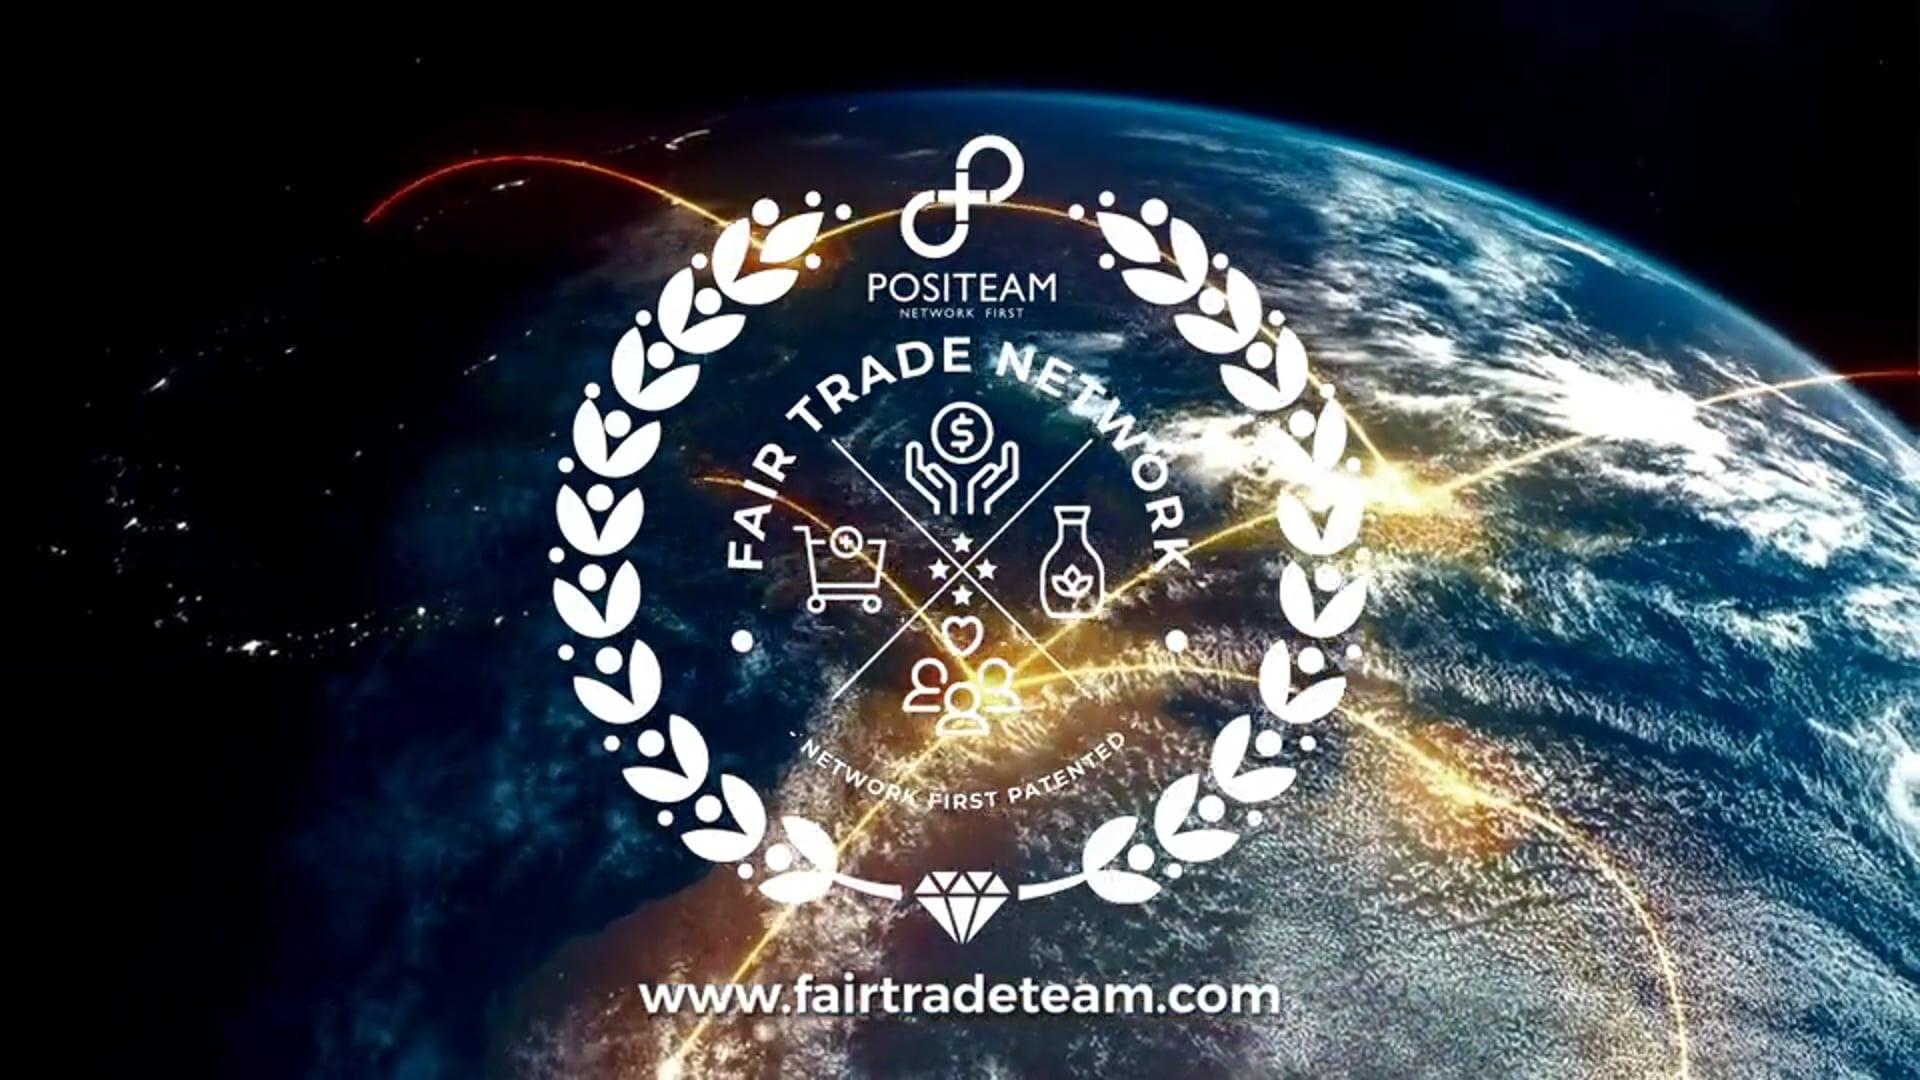 Positeam Fair Trade Network exclusive prelaunch invitation. Eu-Countries and UK